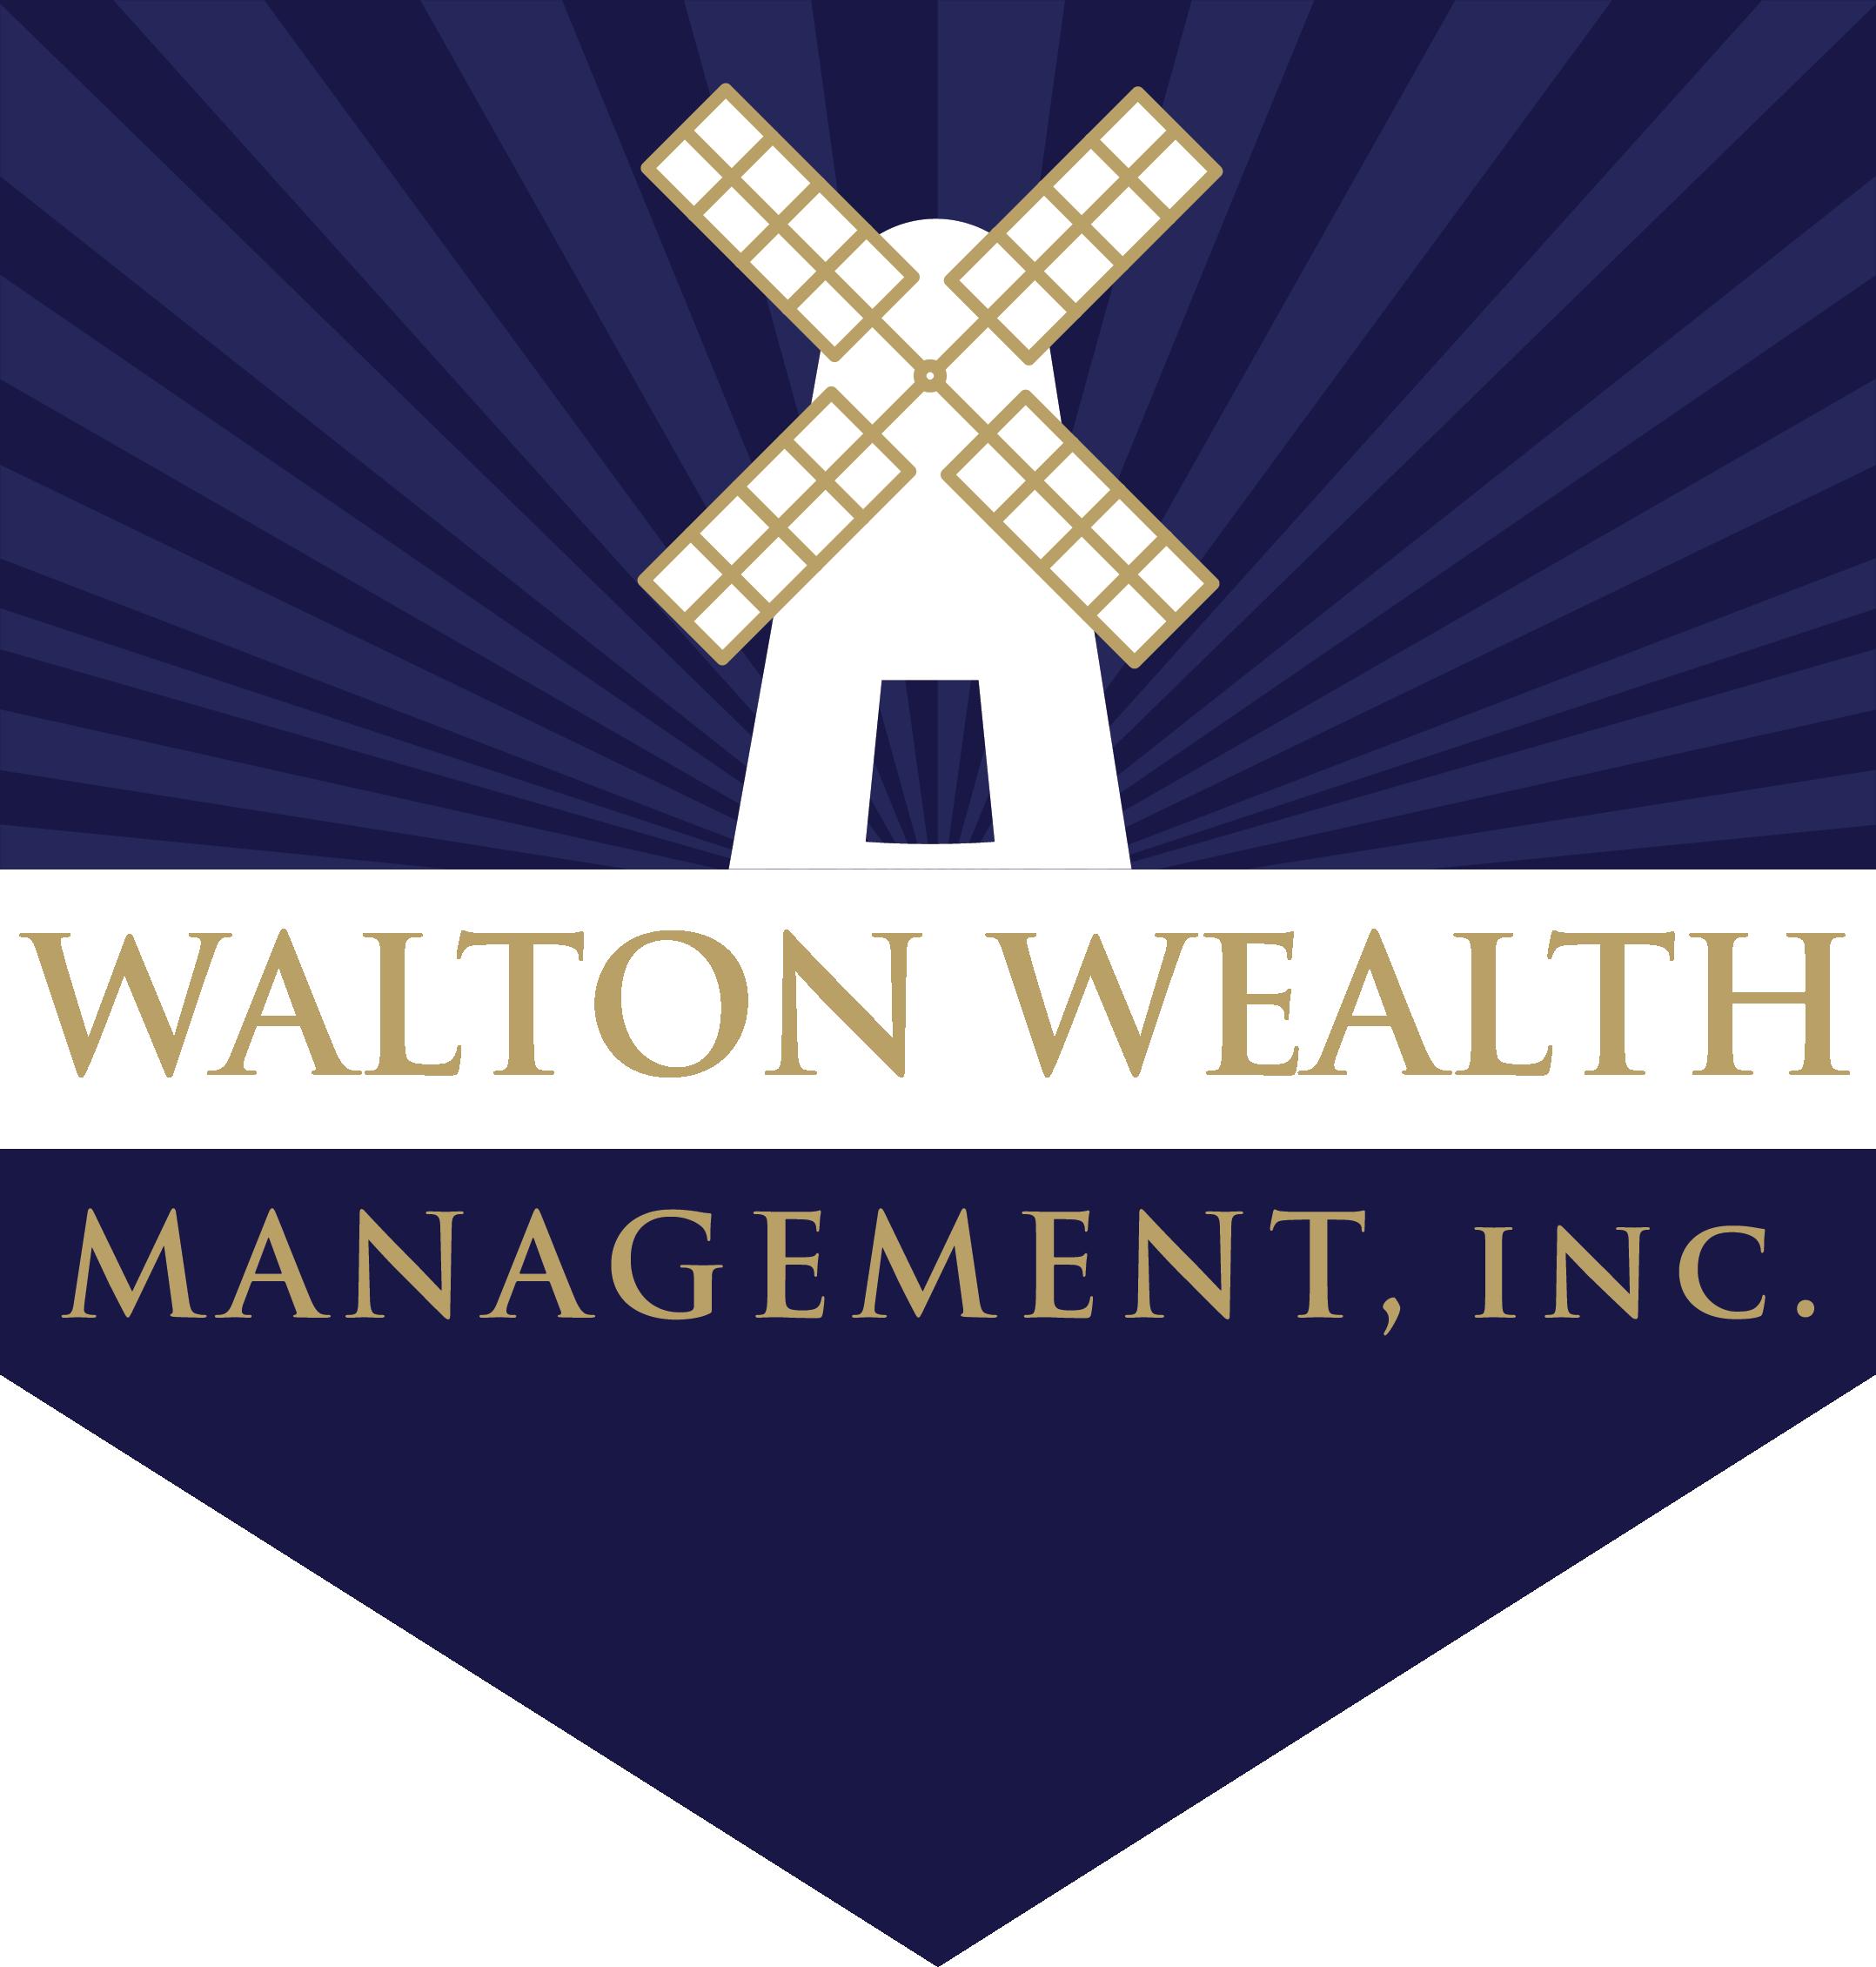 Walton Wealth Management